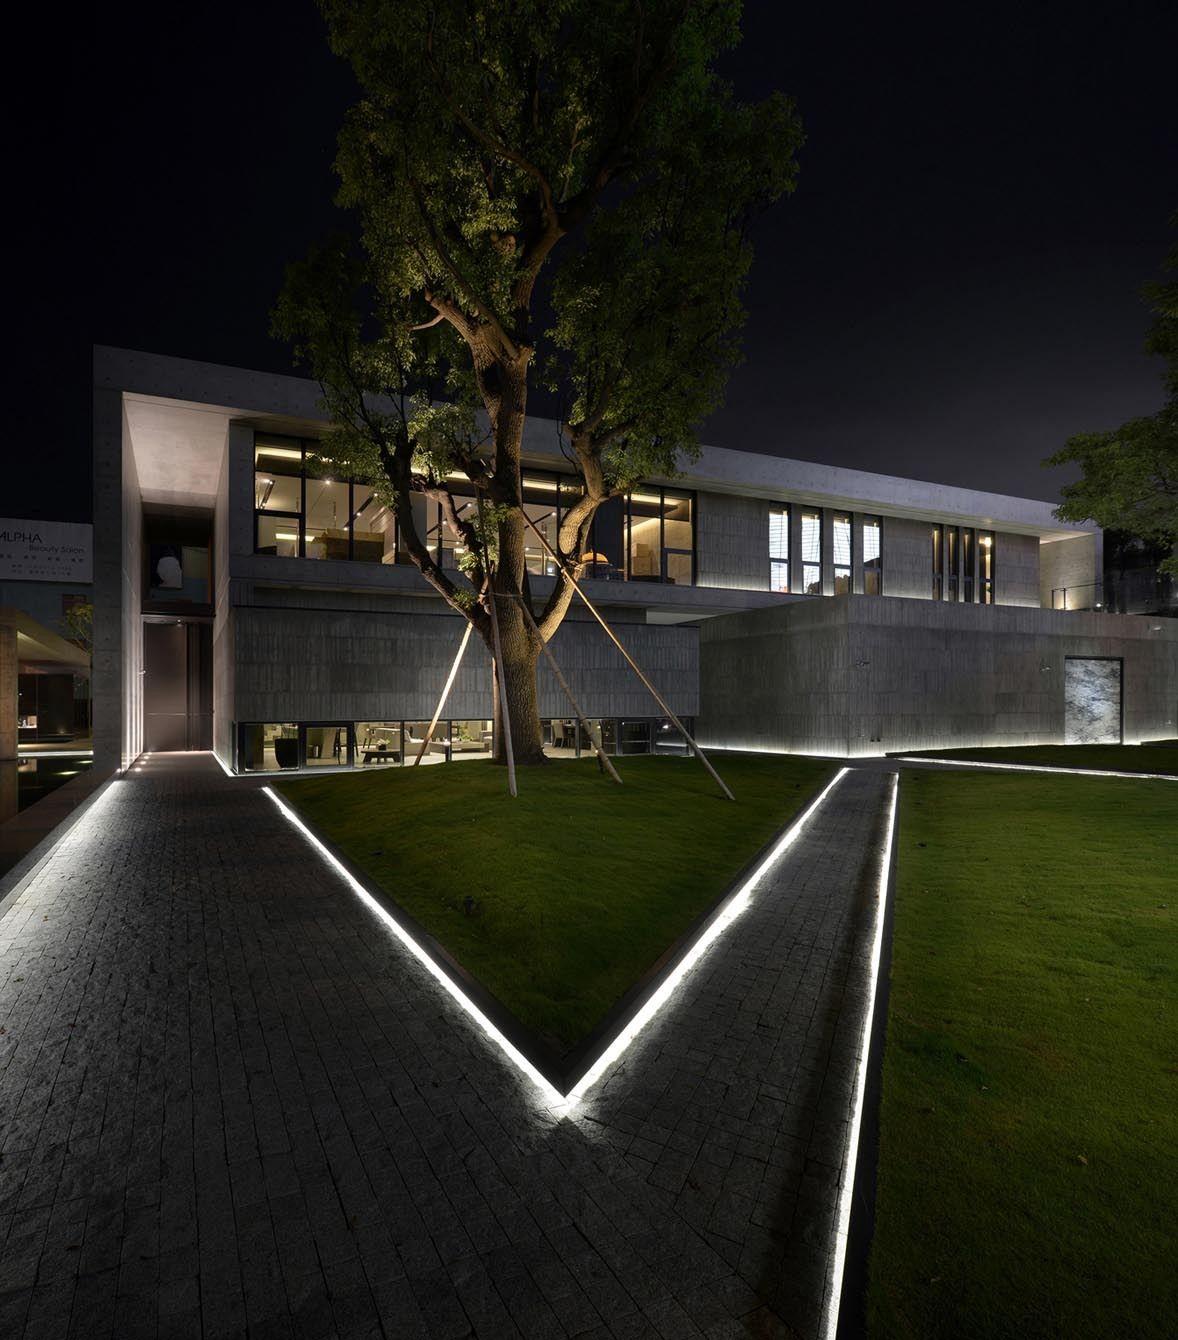 Incubation Reception Center Ching Chi Design Leo Construction Designing Department Xuxian Rui Architects Office Landscape Lighting Design Architecture Exterior Architecture